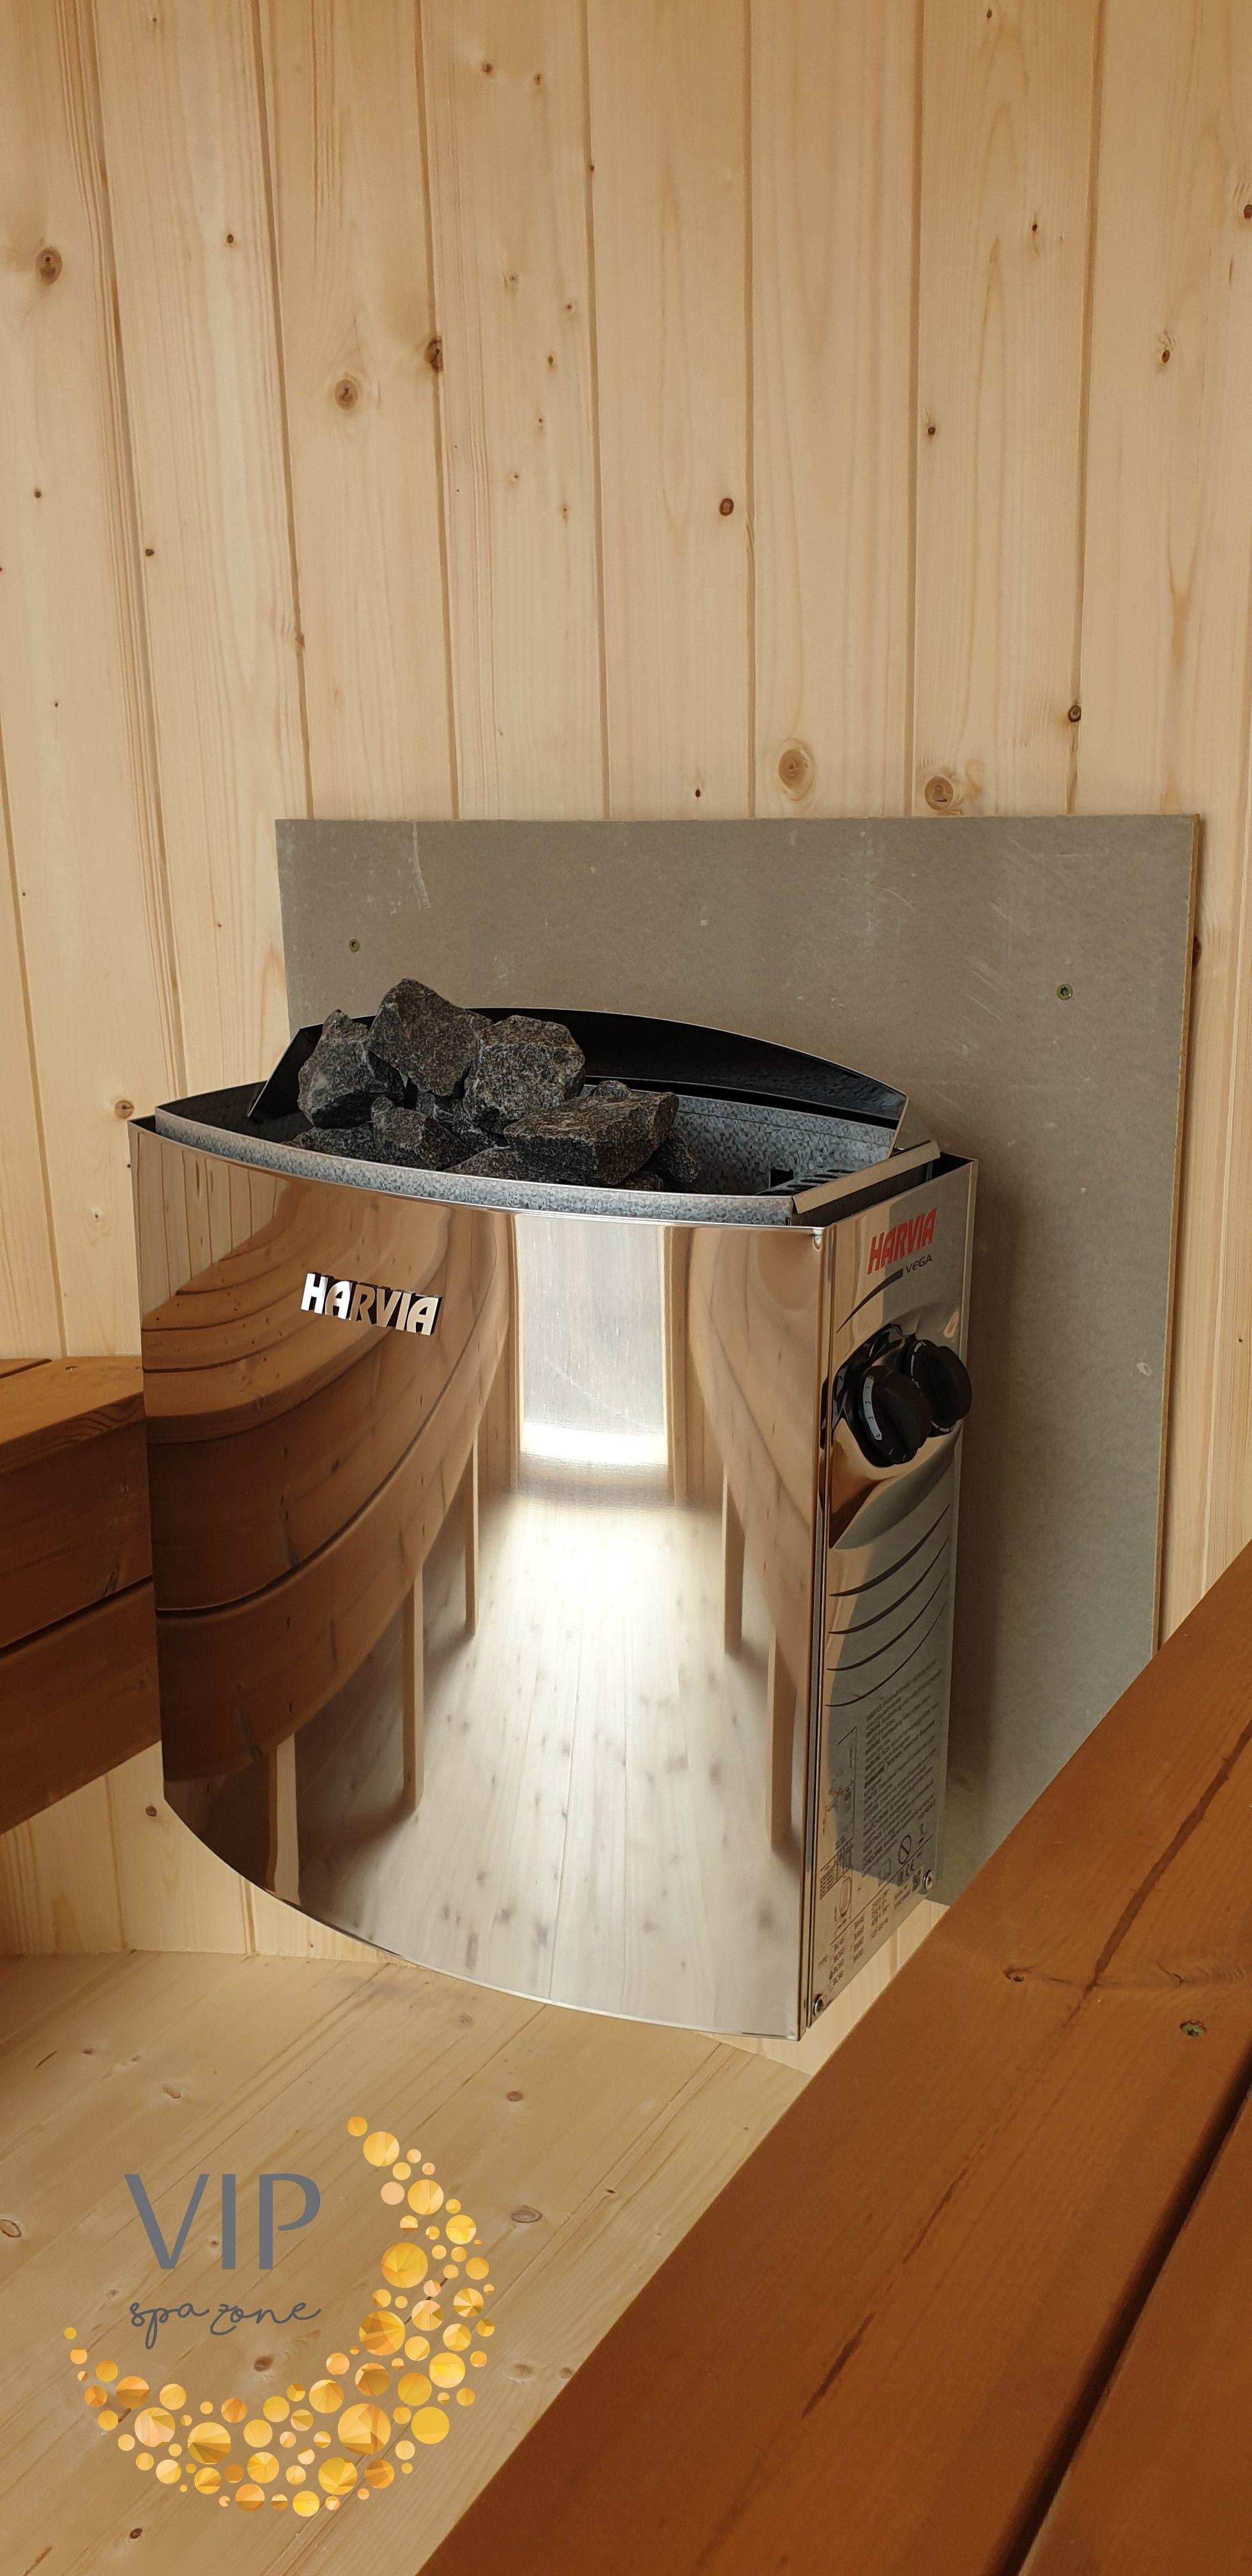 Vertical Sauna With Pretty Little Harvia Heater Heats Well Look Amazing In 2020 Mobile Sauna